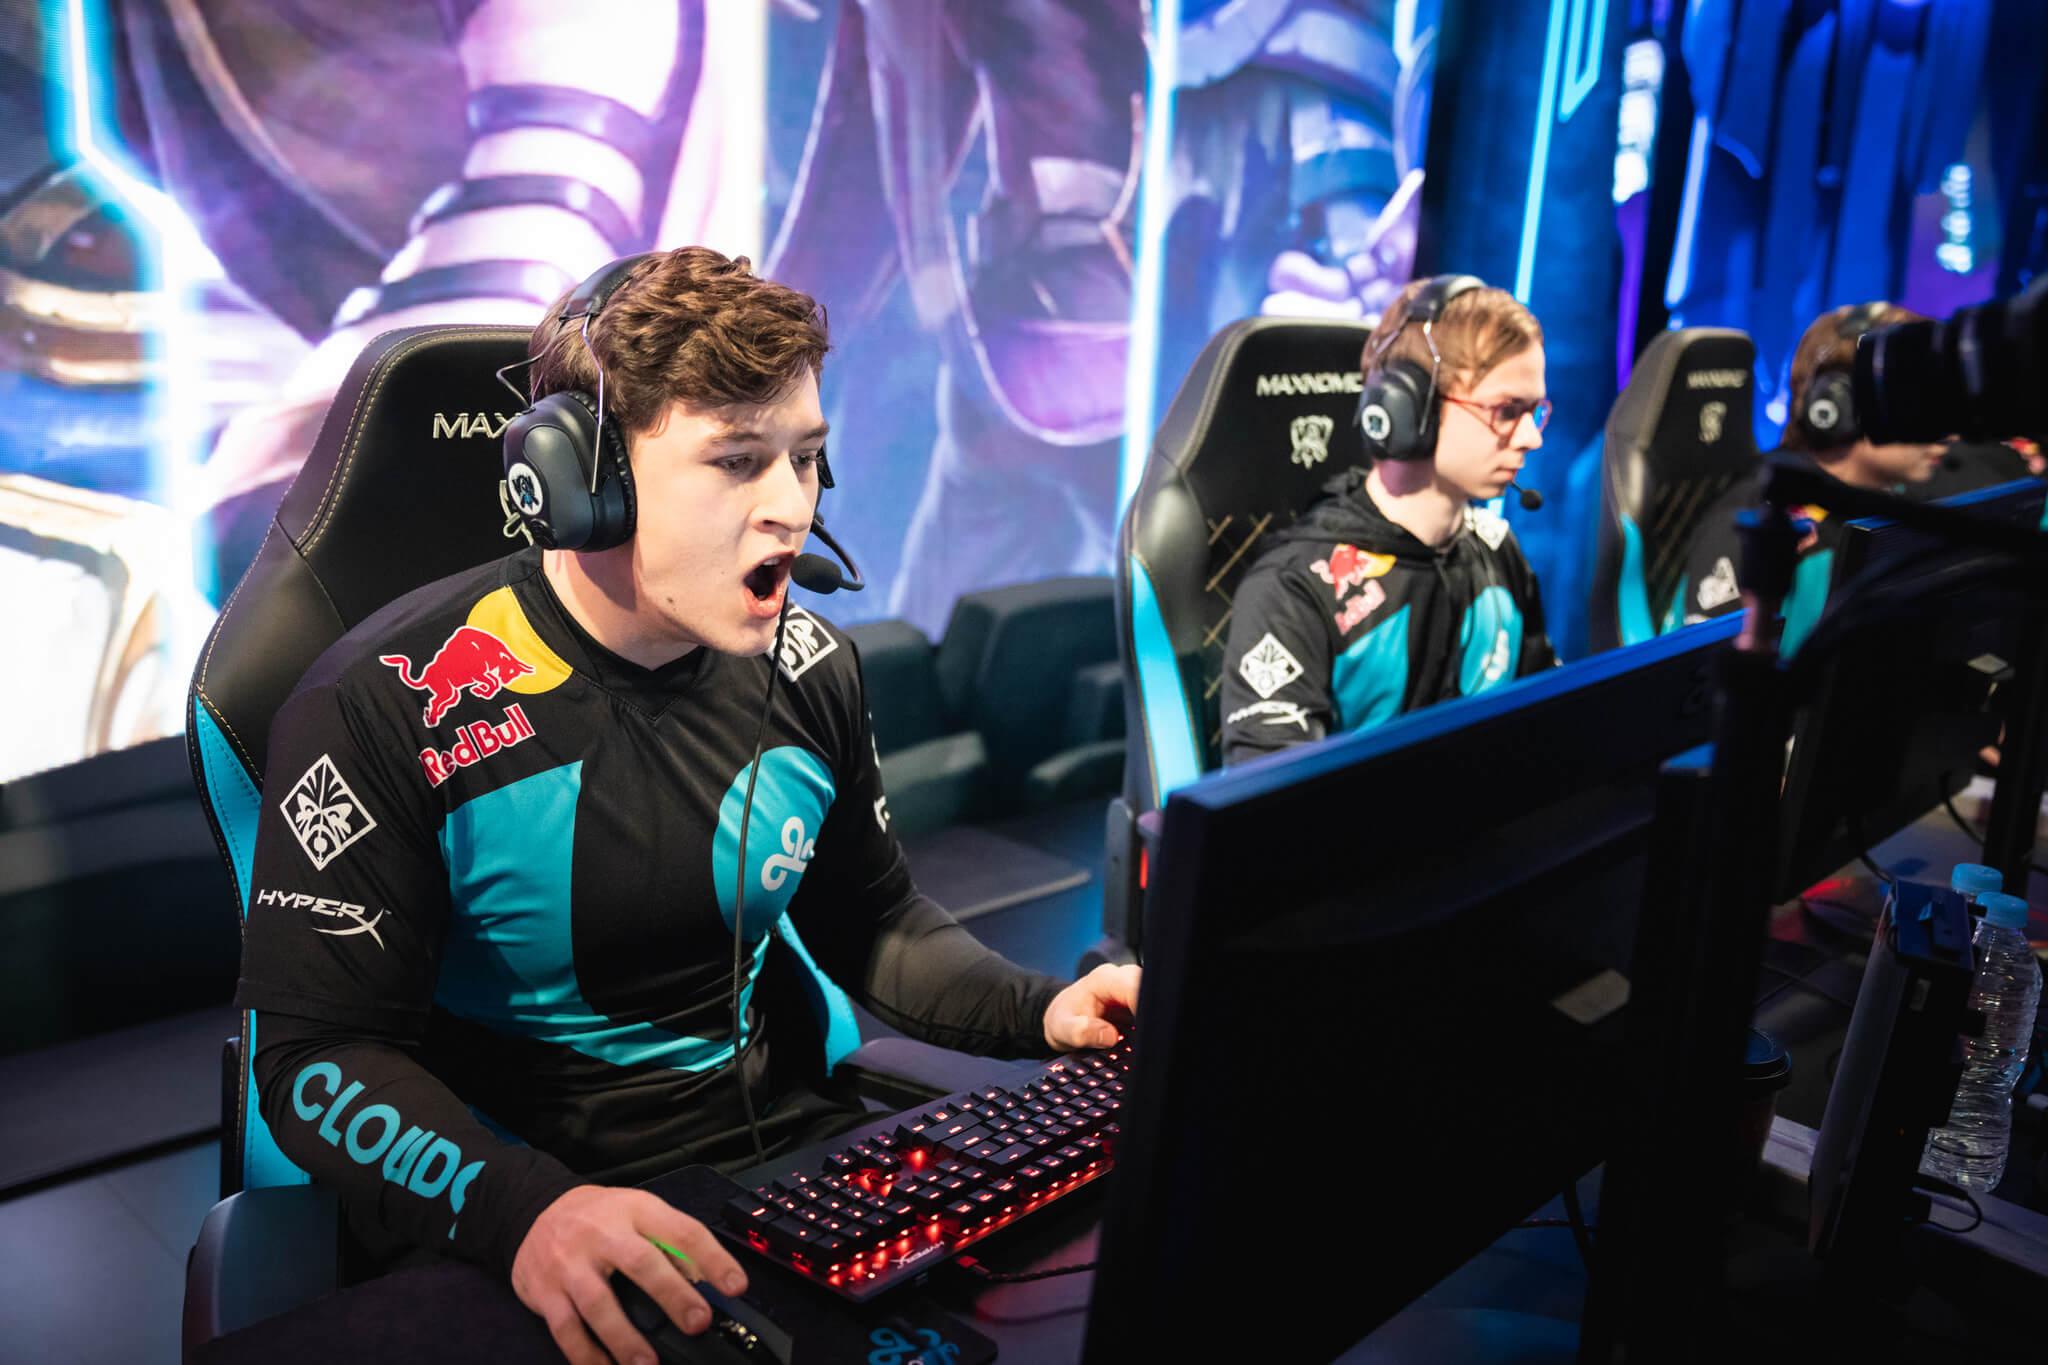 Wild upsets in League of Legends World Championships Quarterfinals